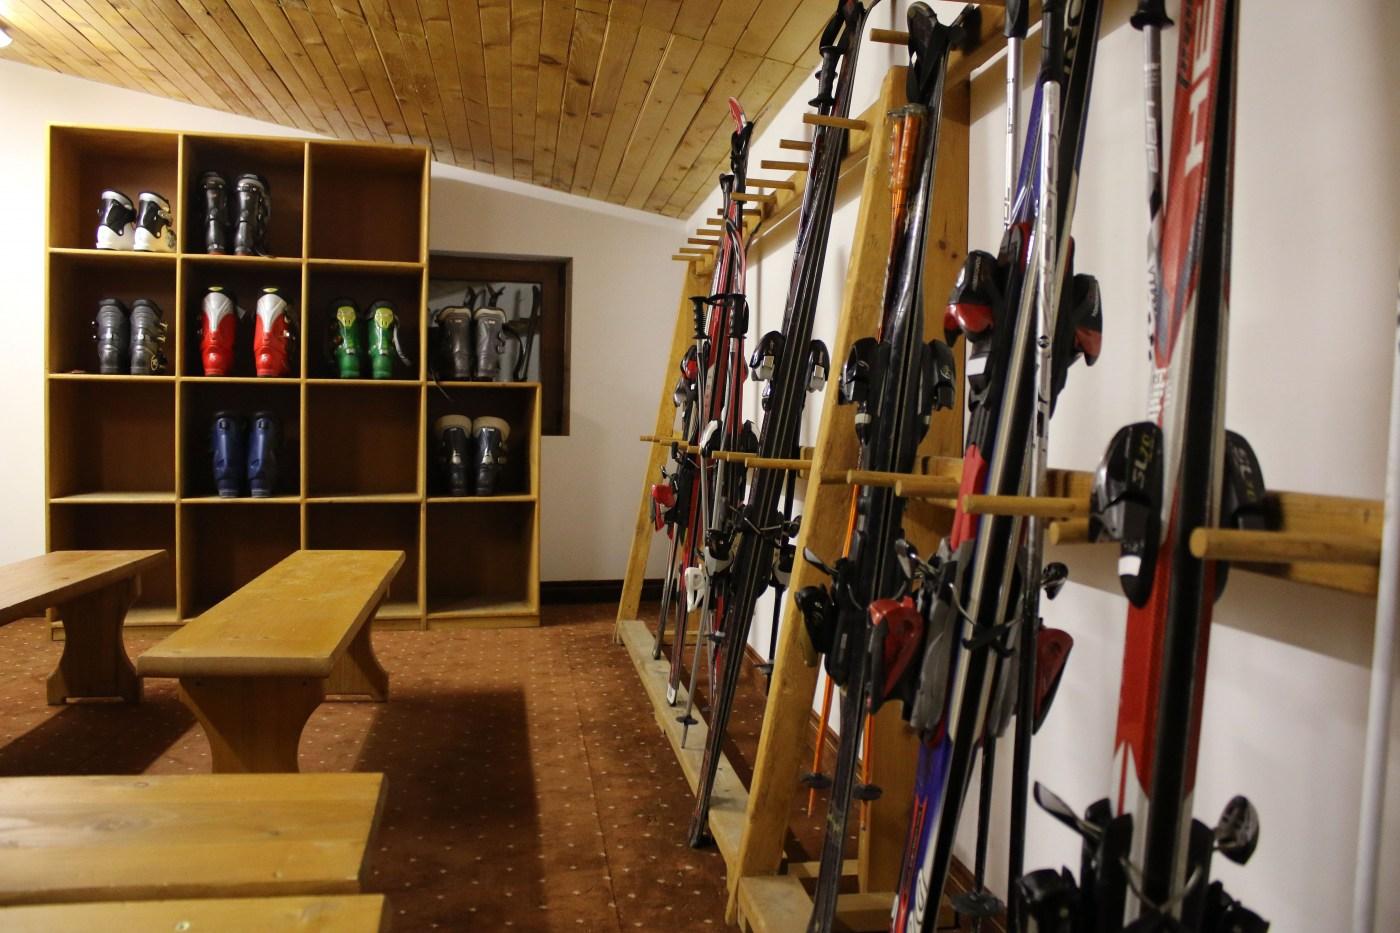 Ски гардероб и оборудване под наем